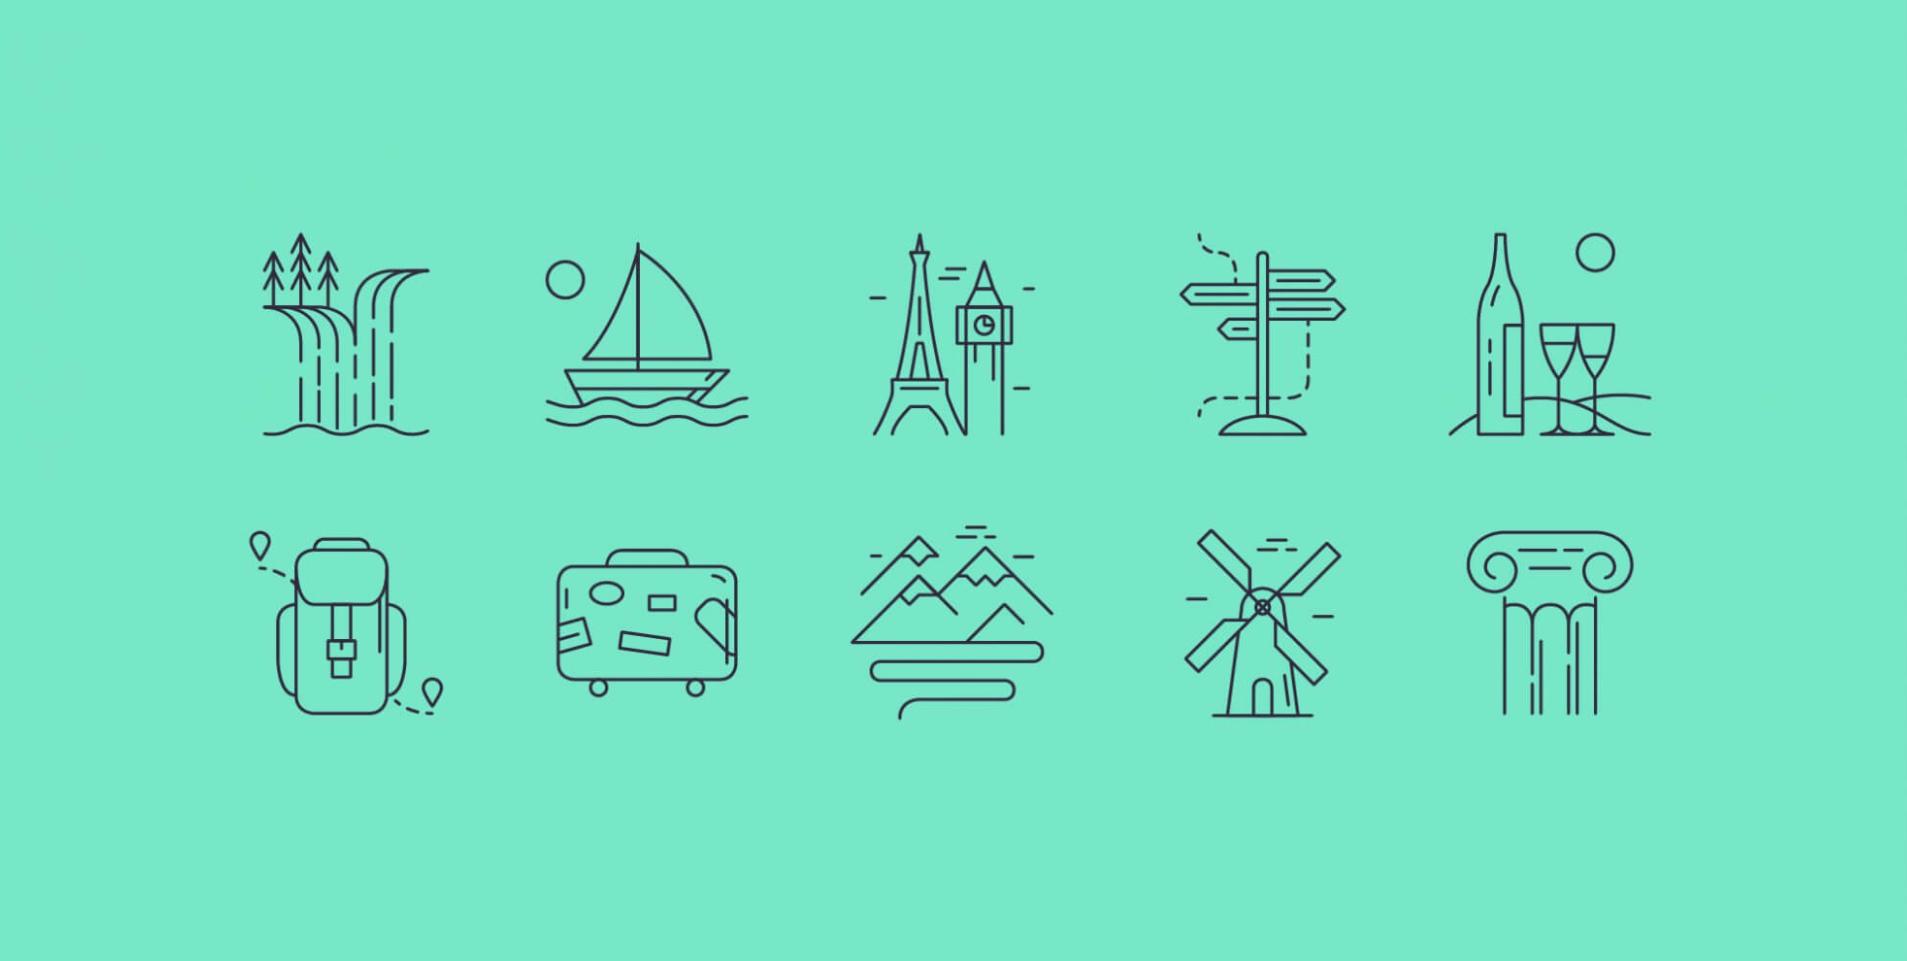 Pin By Christina Danton On Graphic Design